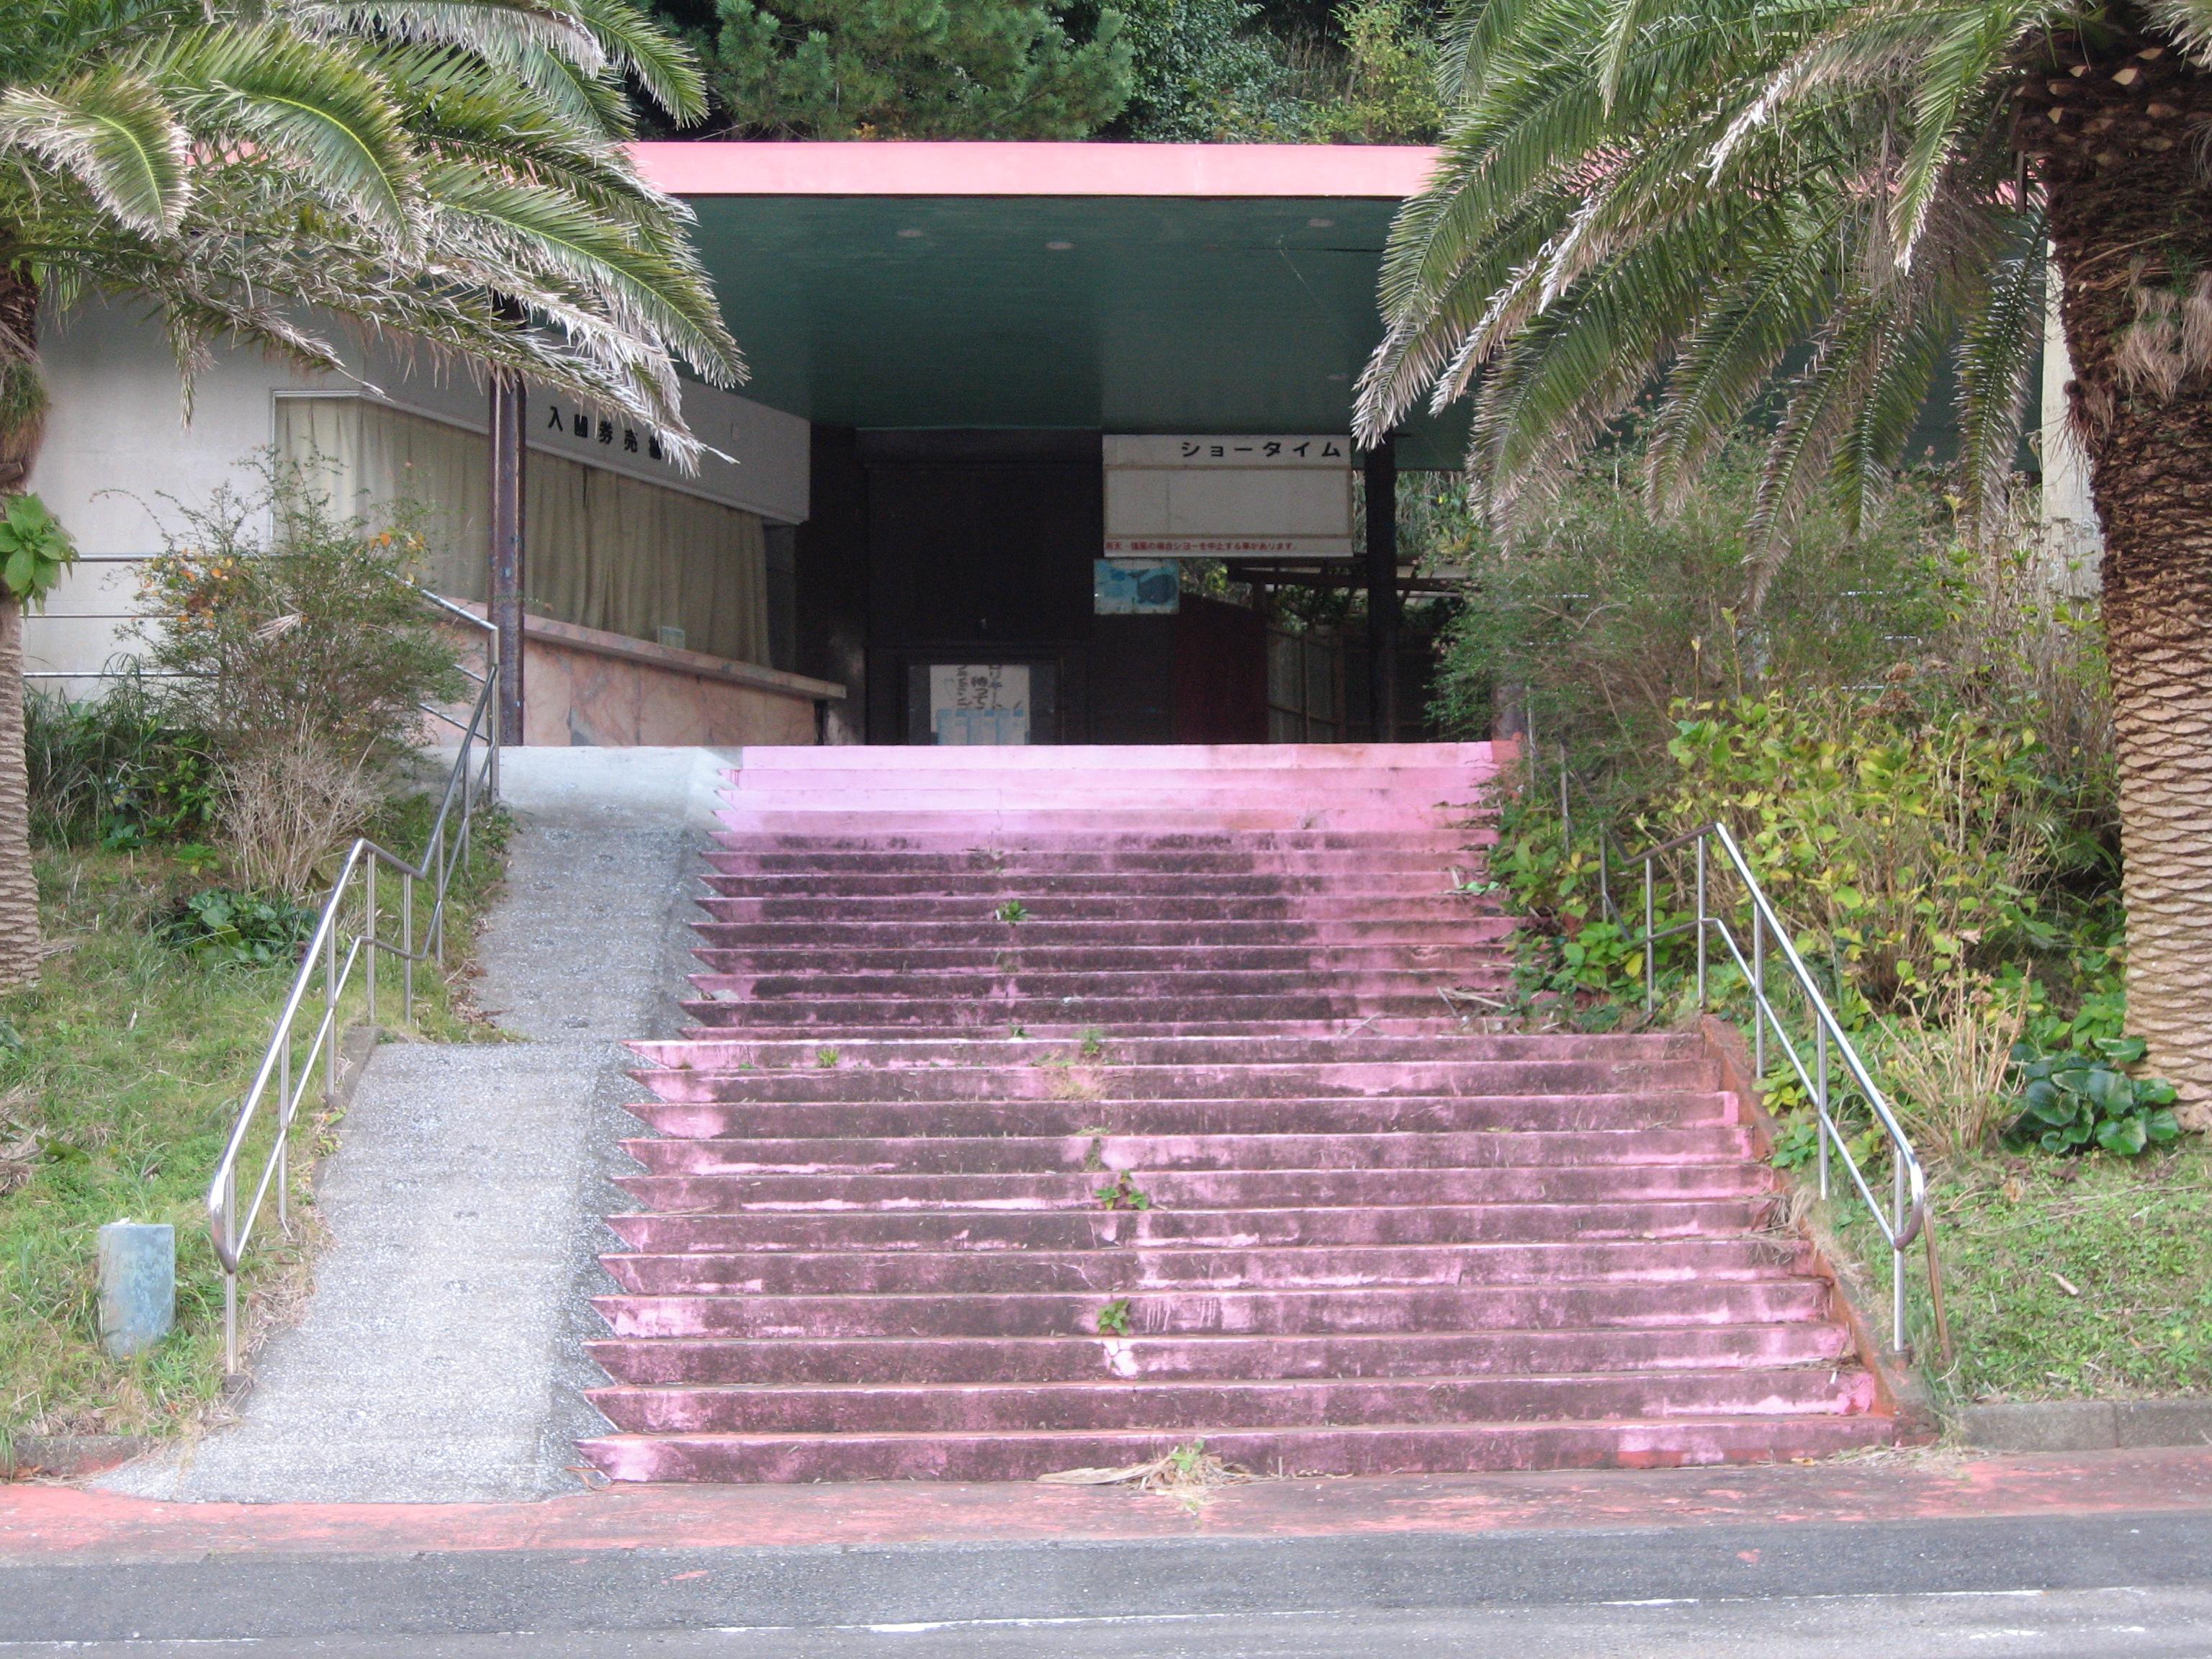 https://upload.wikimedia.org/wikipedia/commons/d/de/Namegawa-island-entrance.jpg